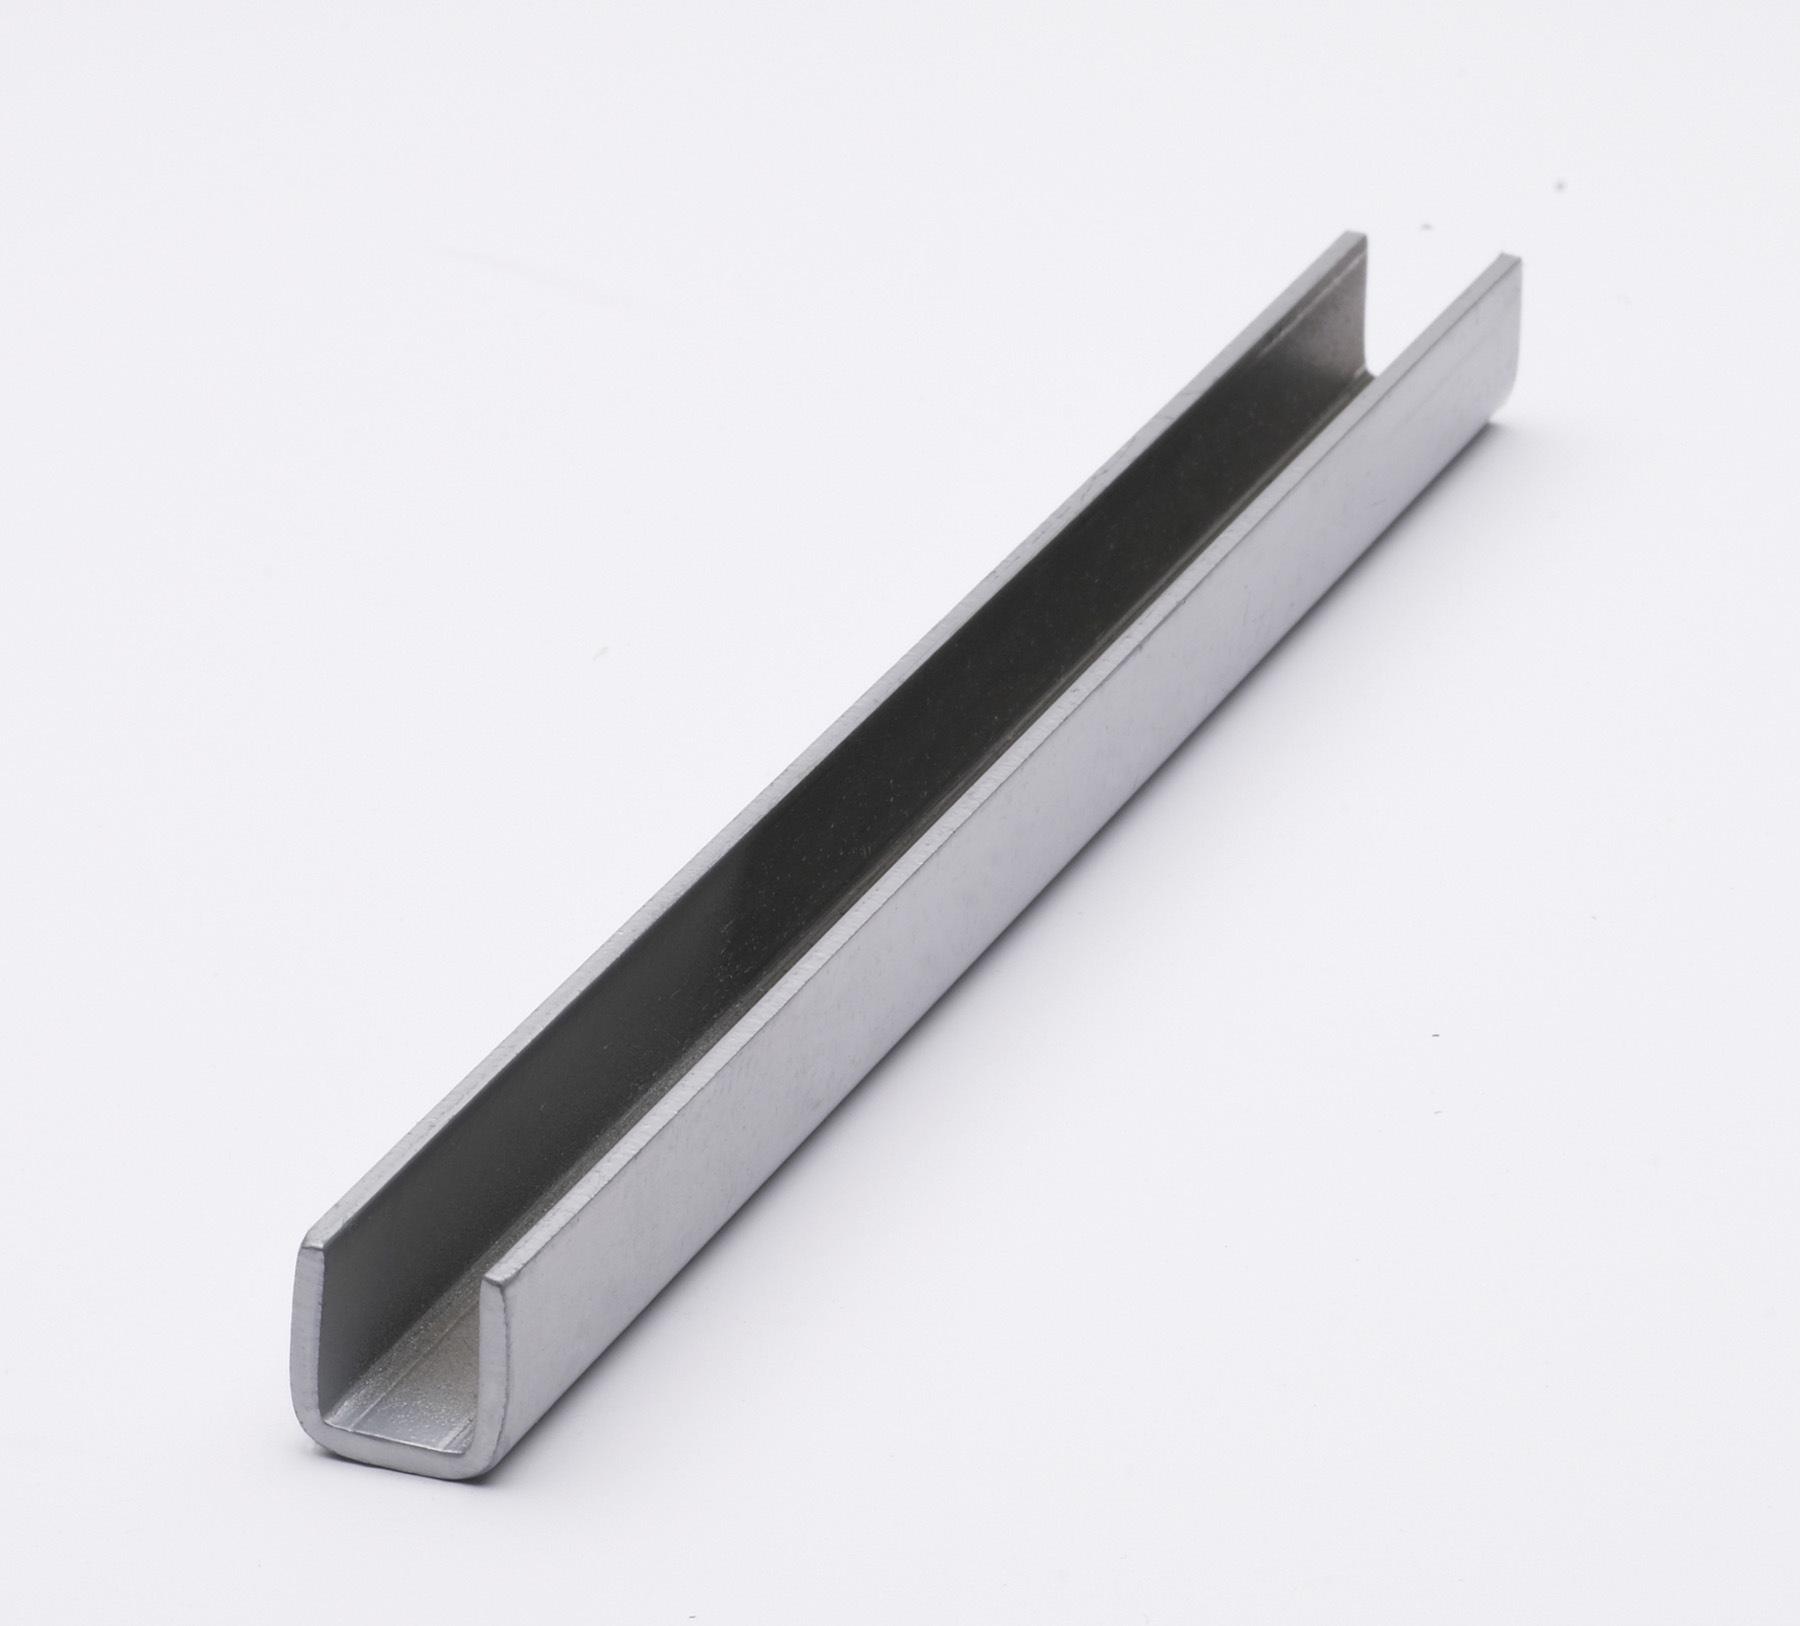 Steel channel shapes